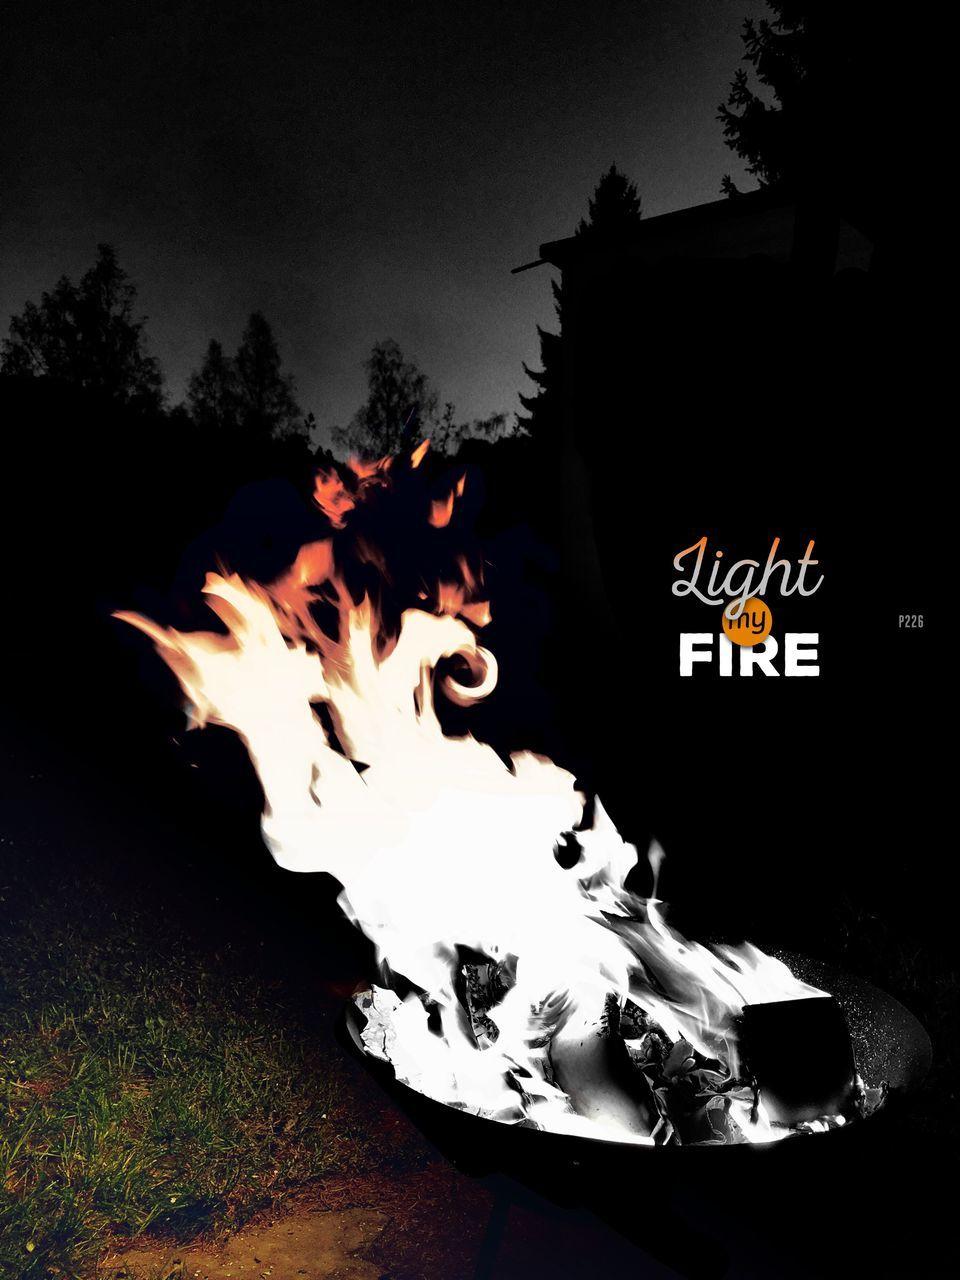 flame, no people, burning, tree, night, outdoors, illuminated, sky